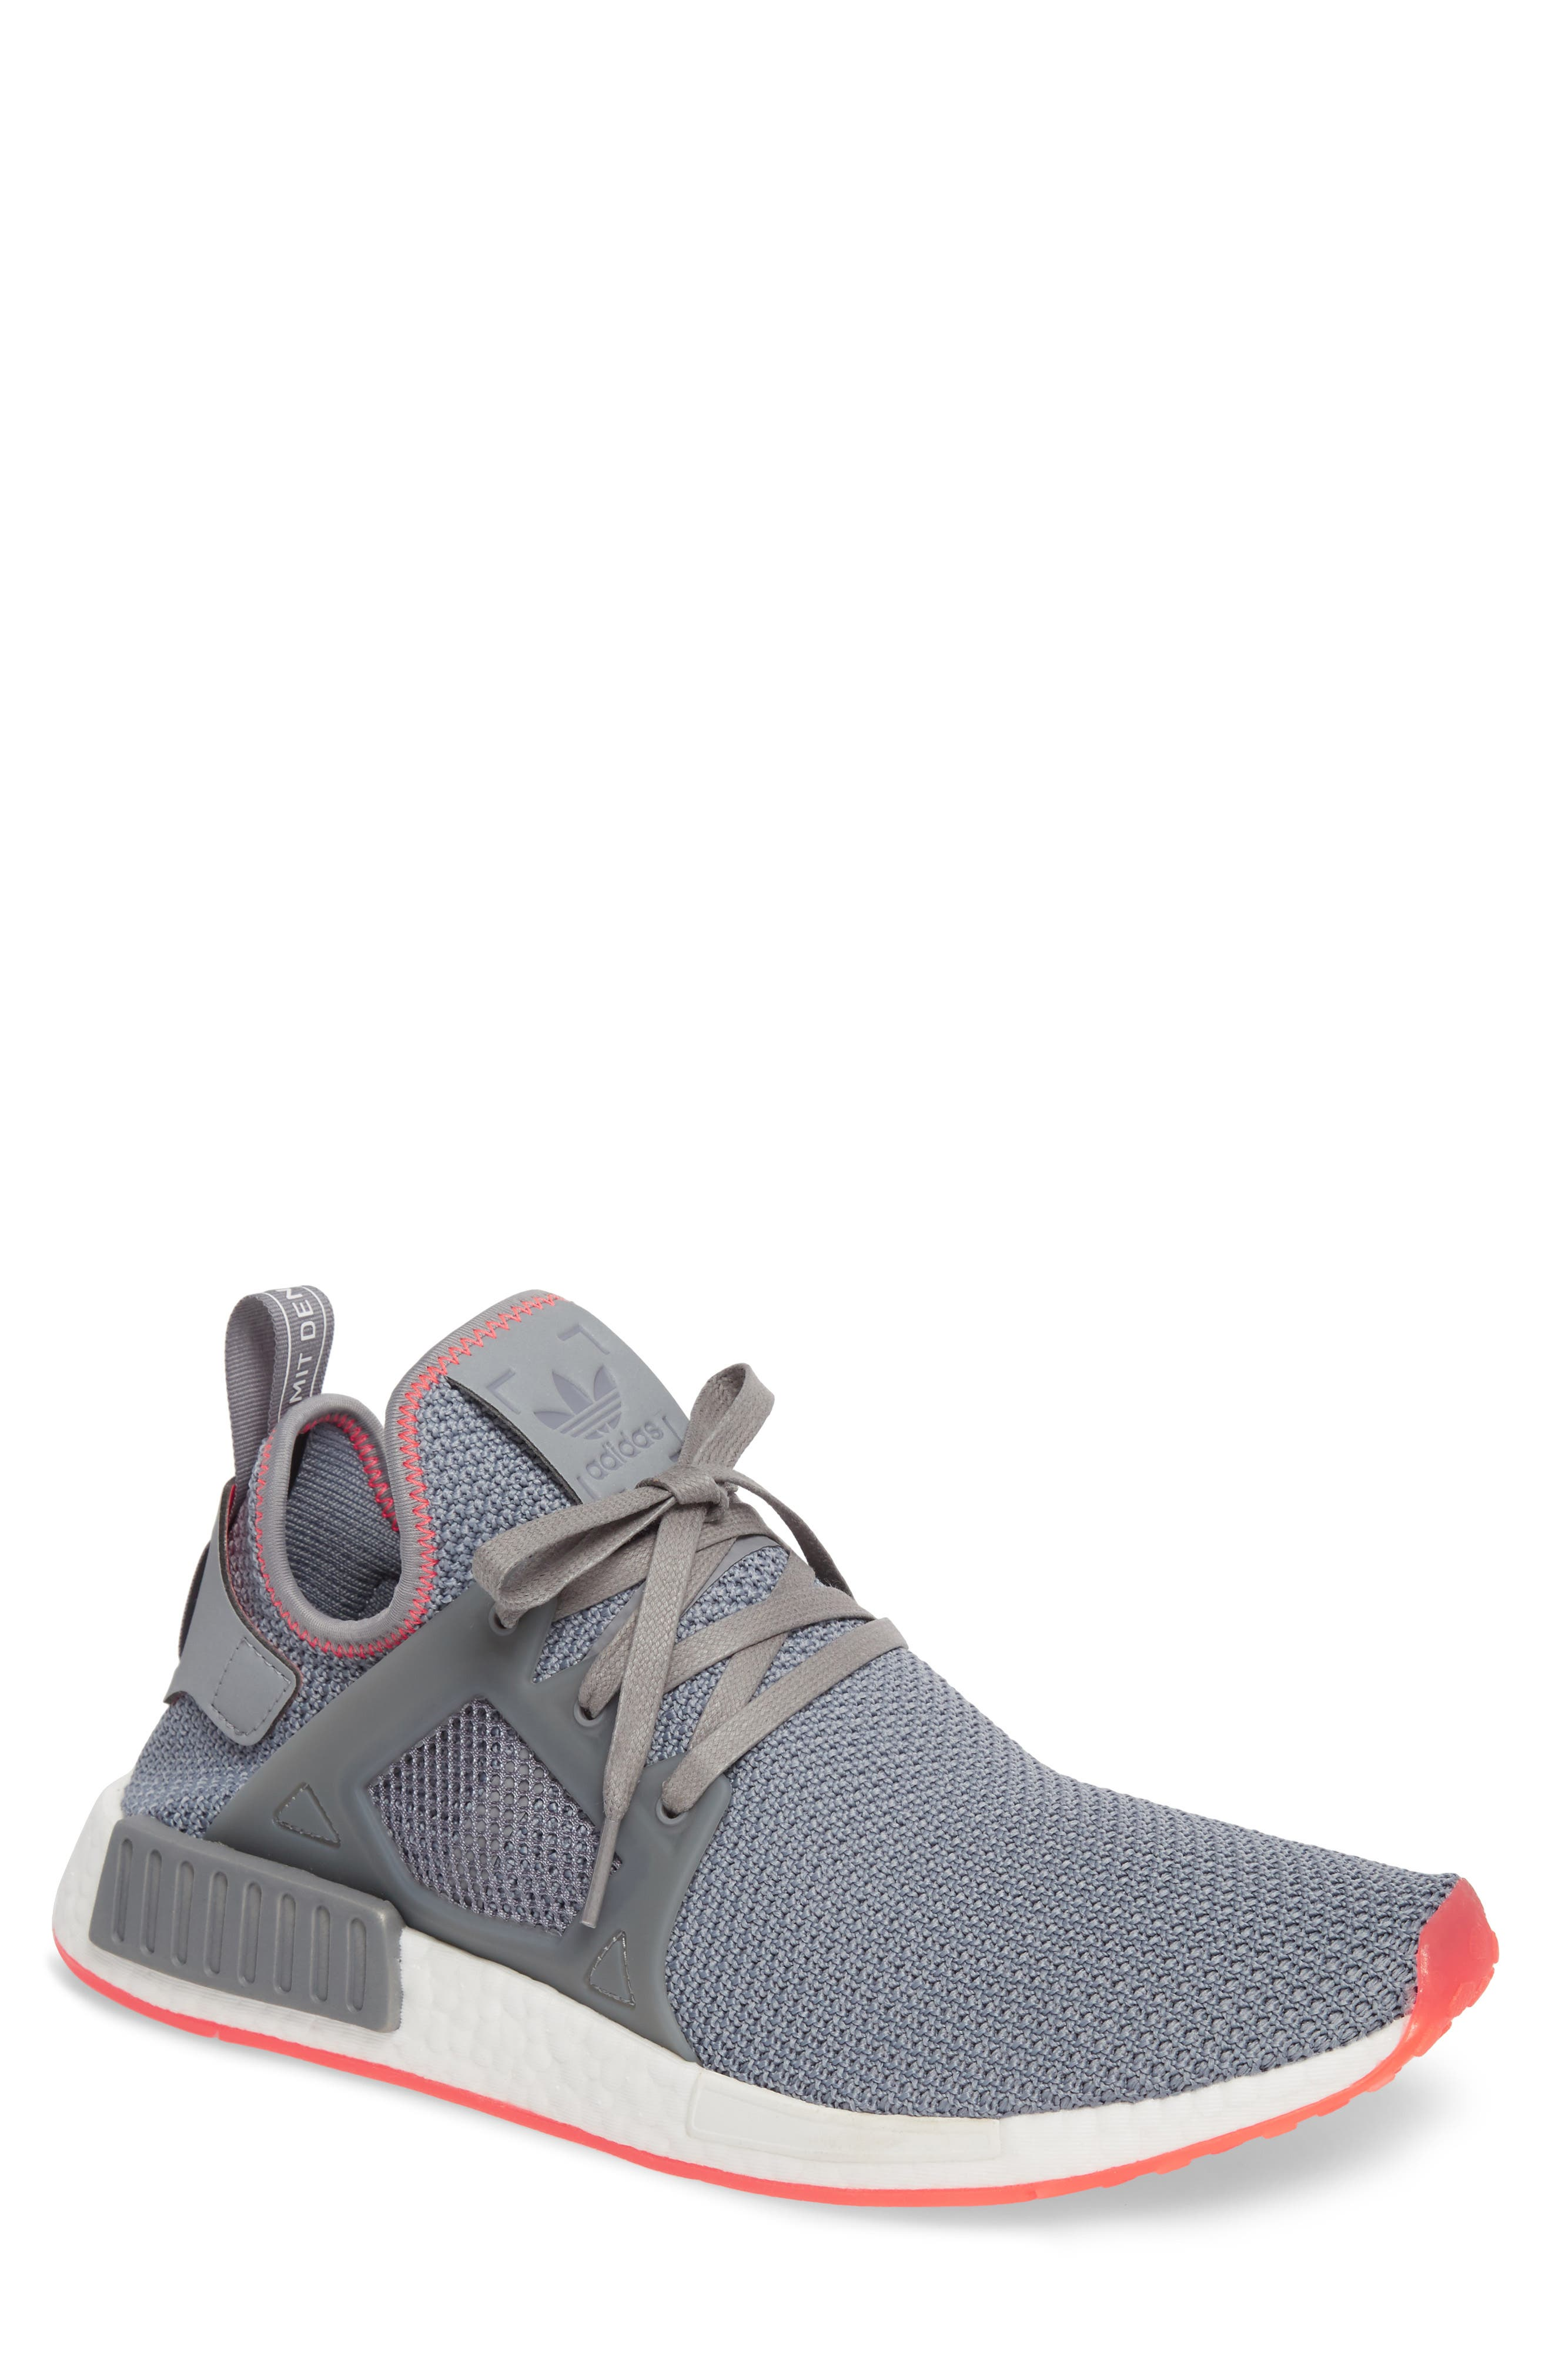 NMD_XR1 Sneaker,                             Main thumbnail 2, color,